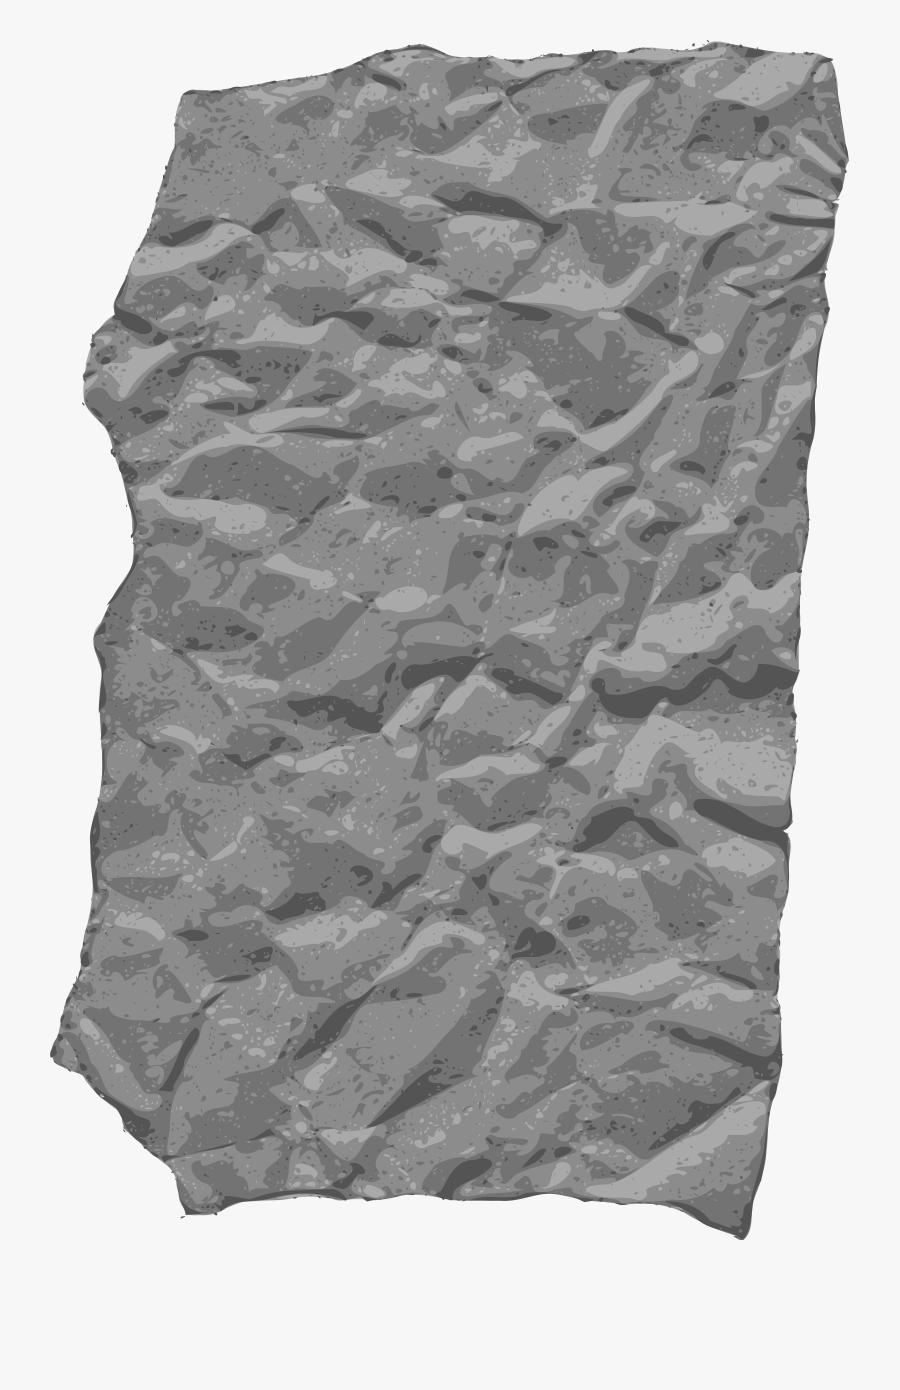 Torn Paper 02 Clip Arts - Paper Texture Ripped Paper Png, Transparent Clipart